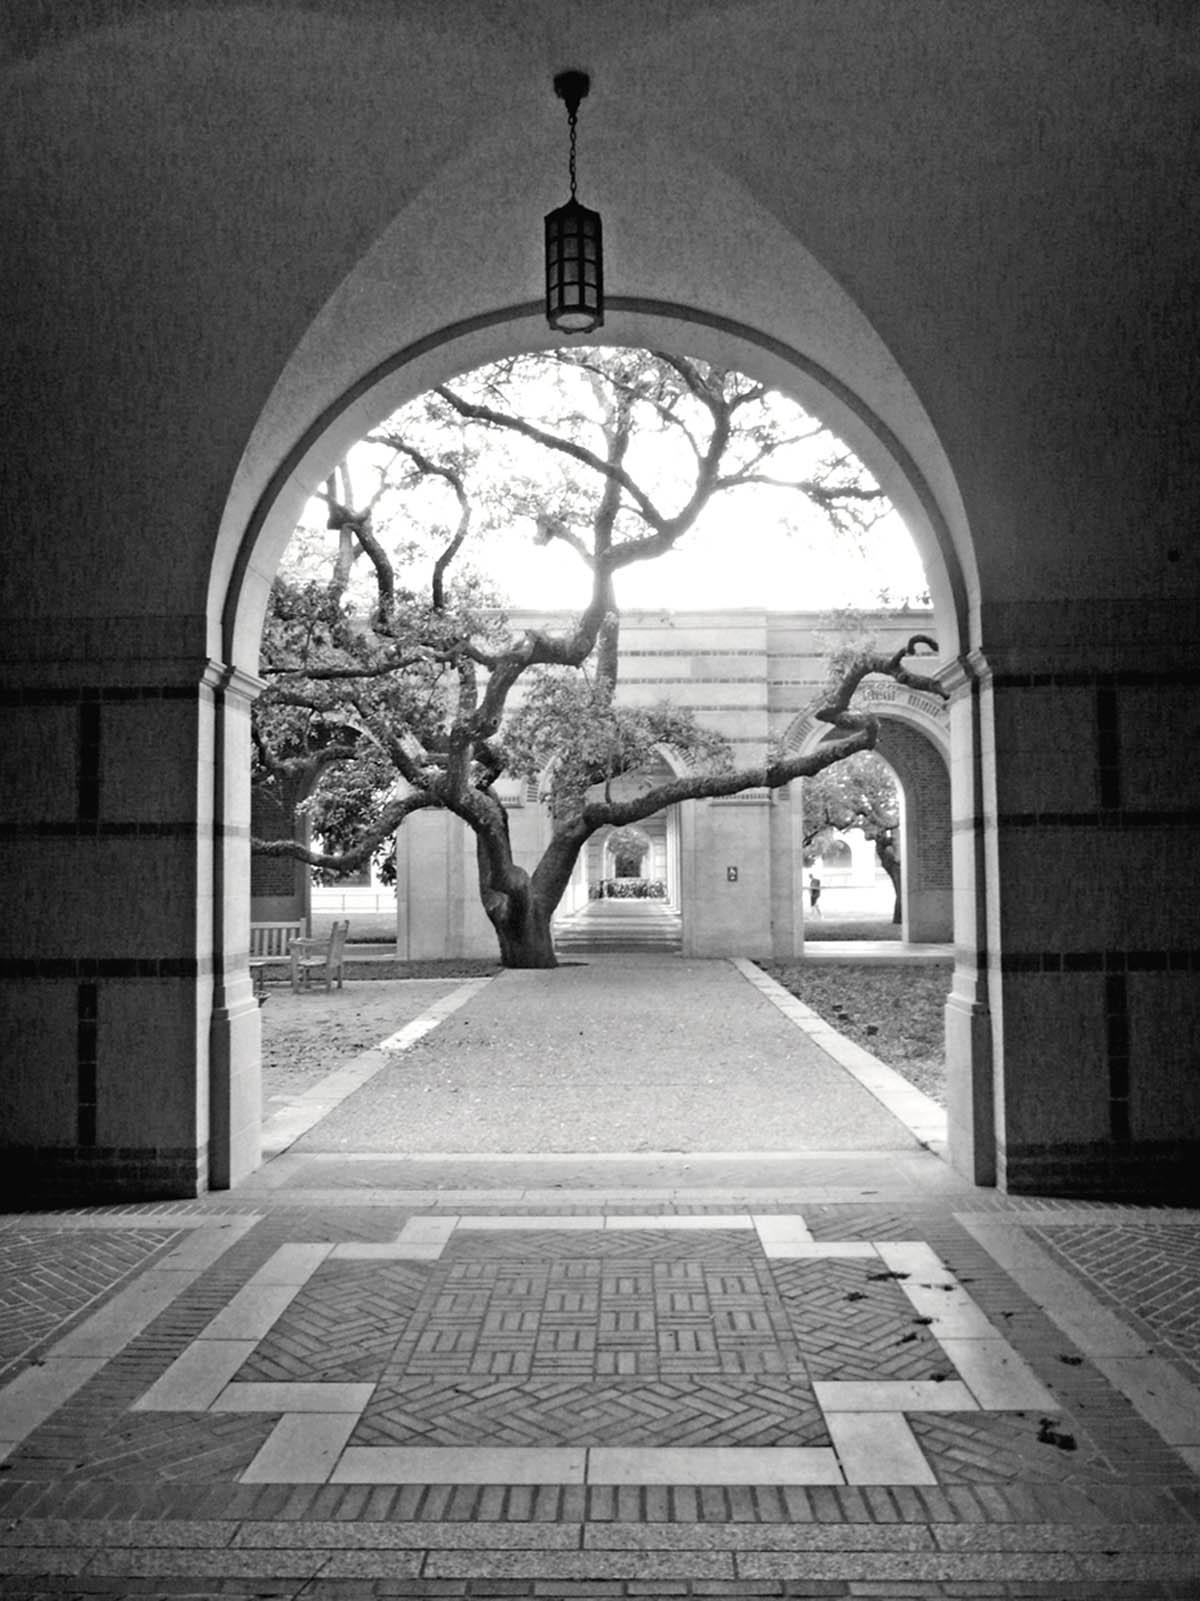 Rice University photo by Carol Ciarniello